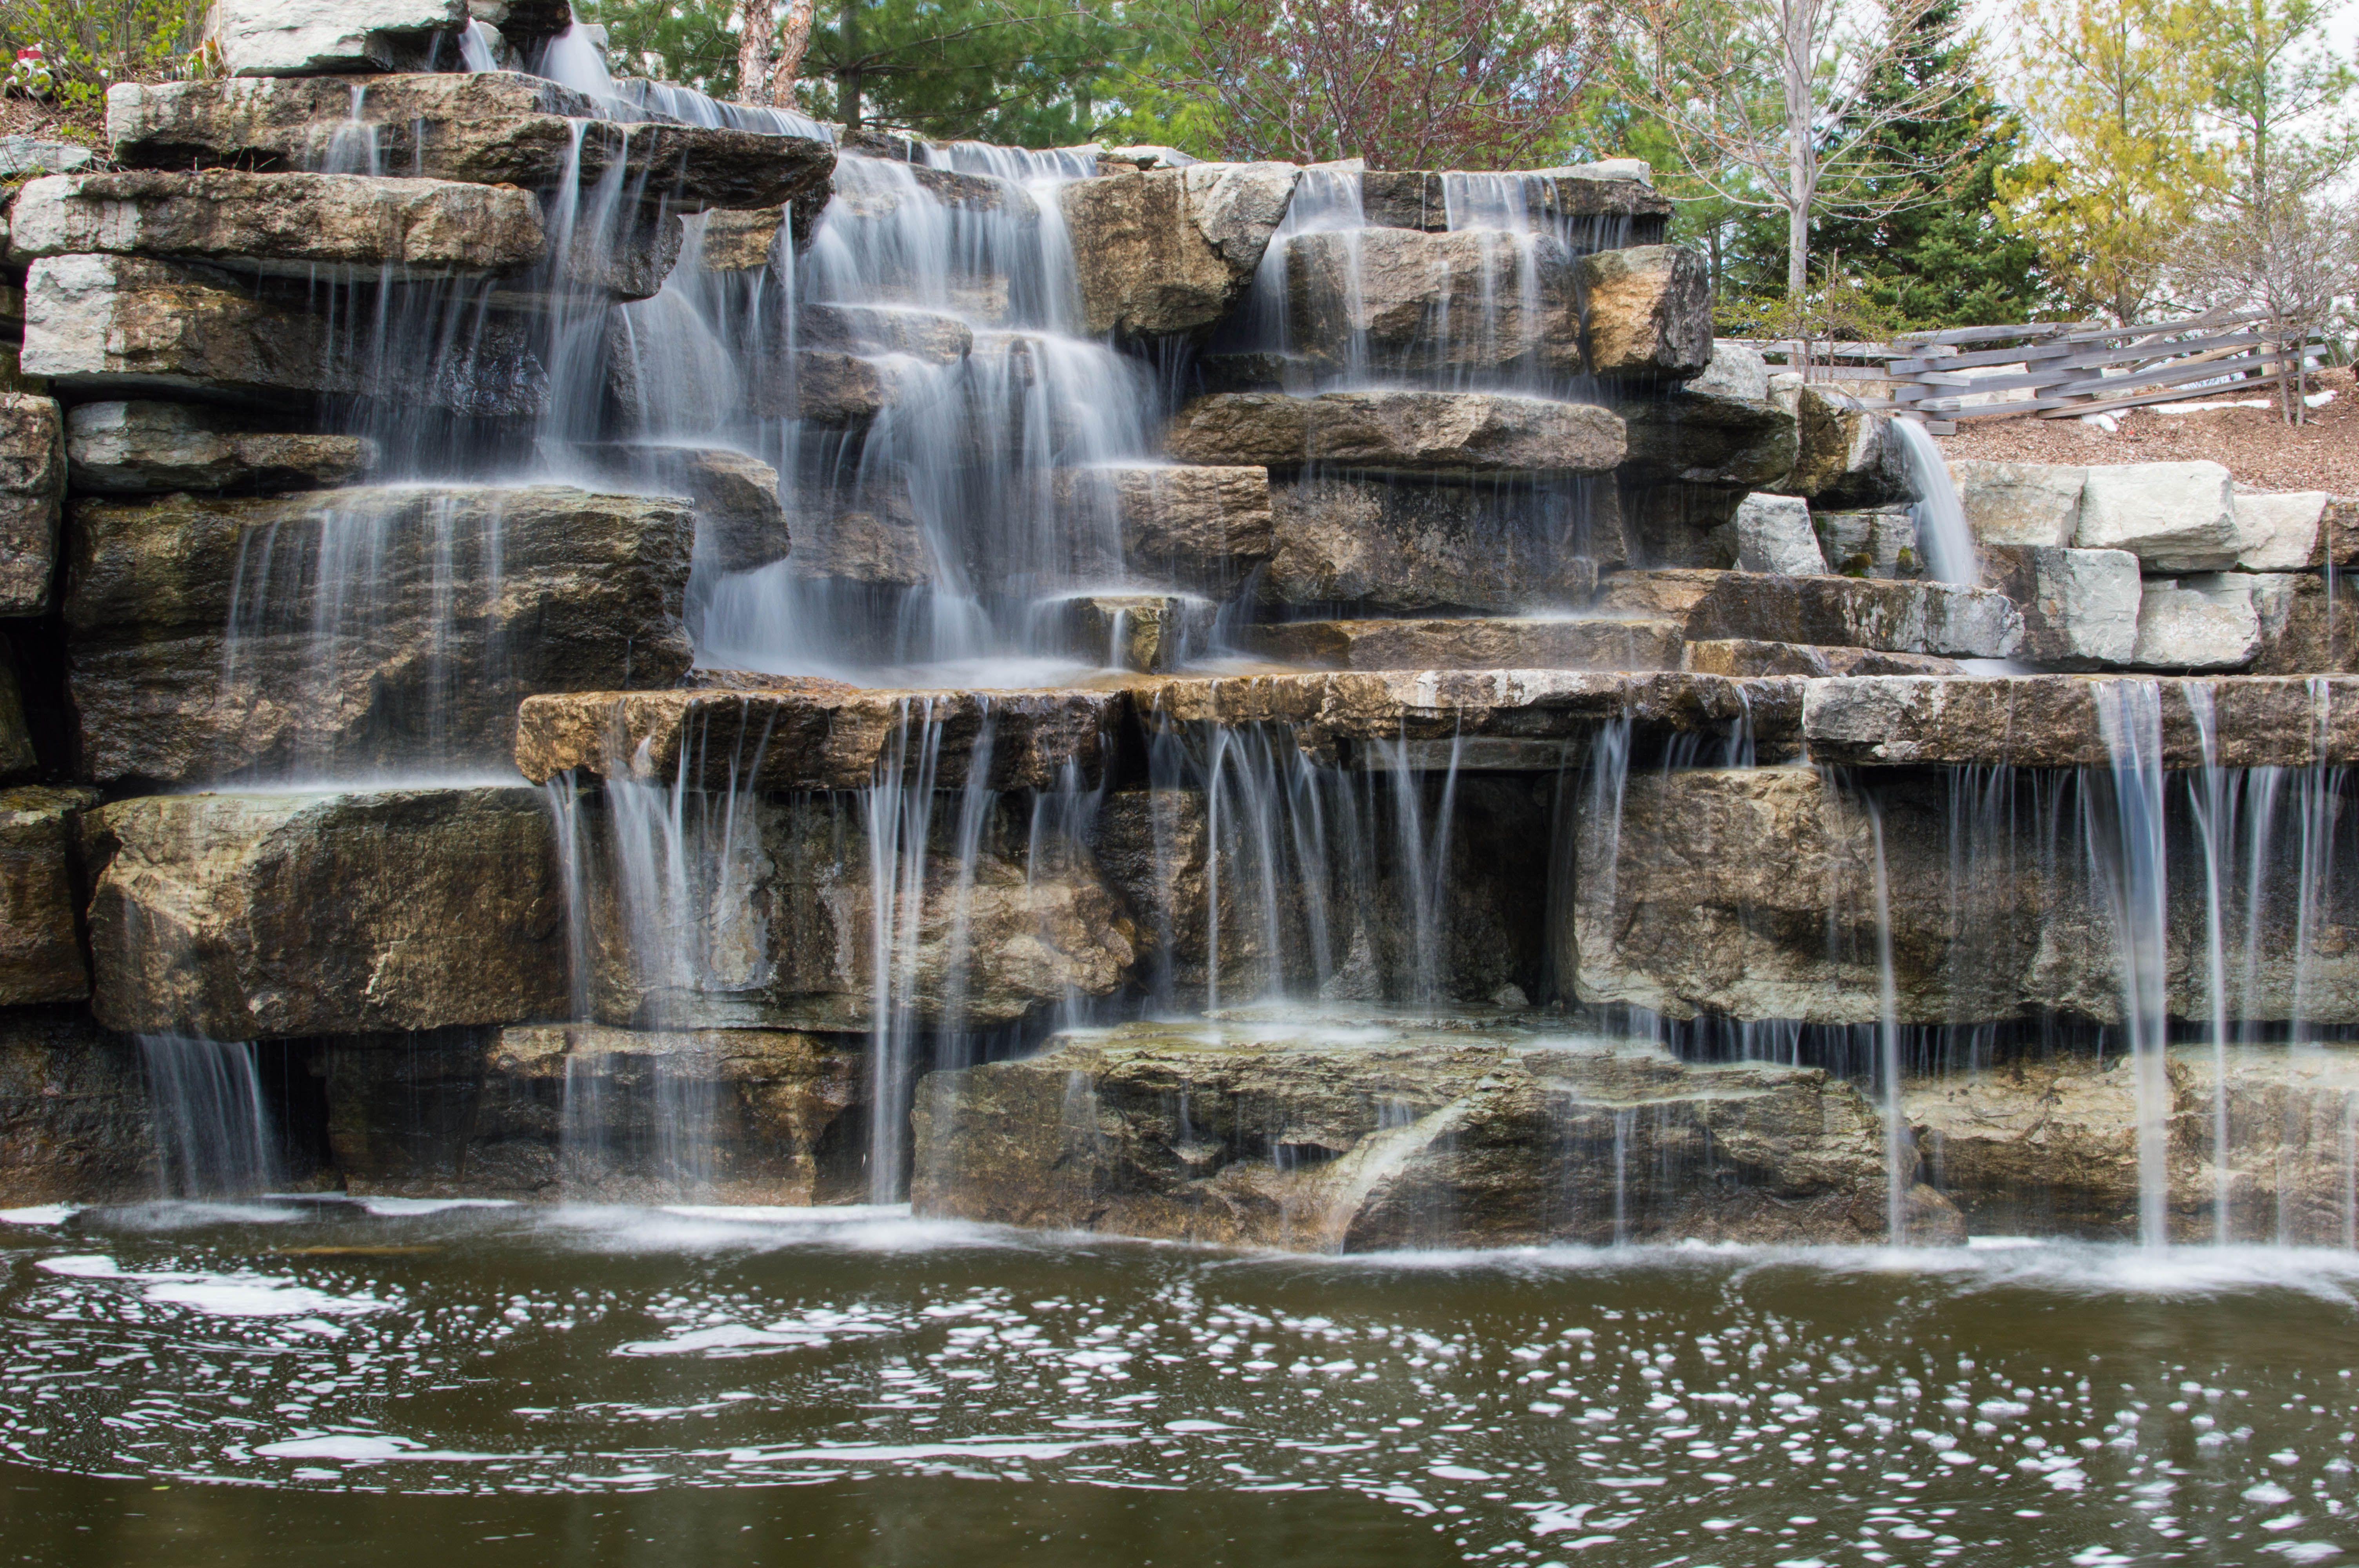 Bay Beach Sanctuary Waterfall | Waterfalls backyard, Diy ...